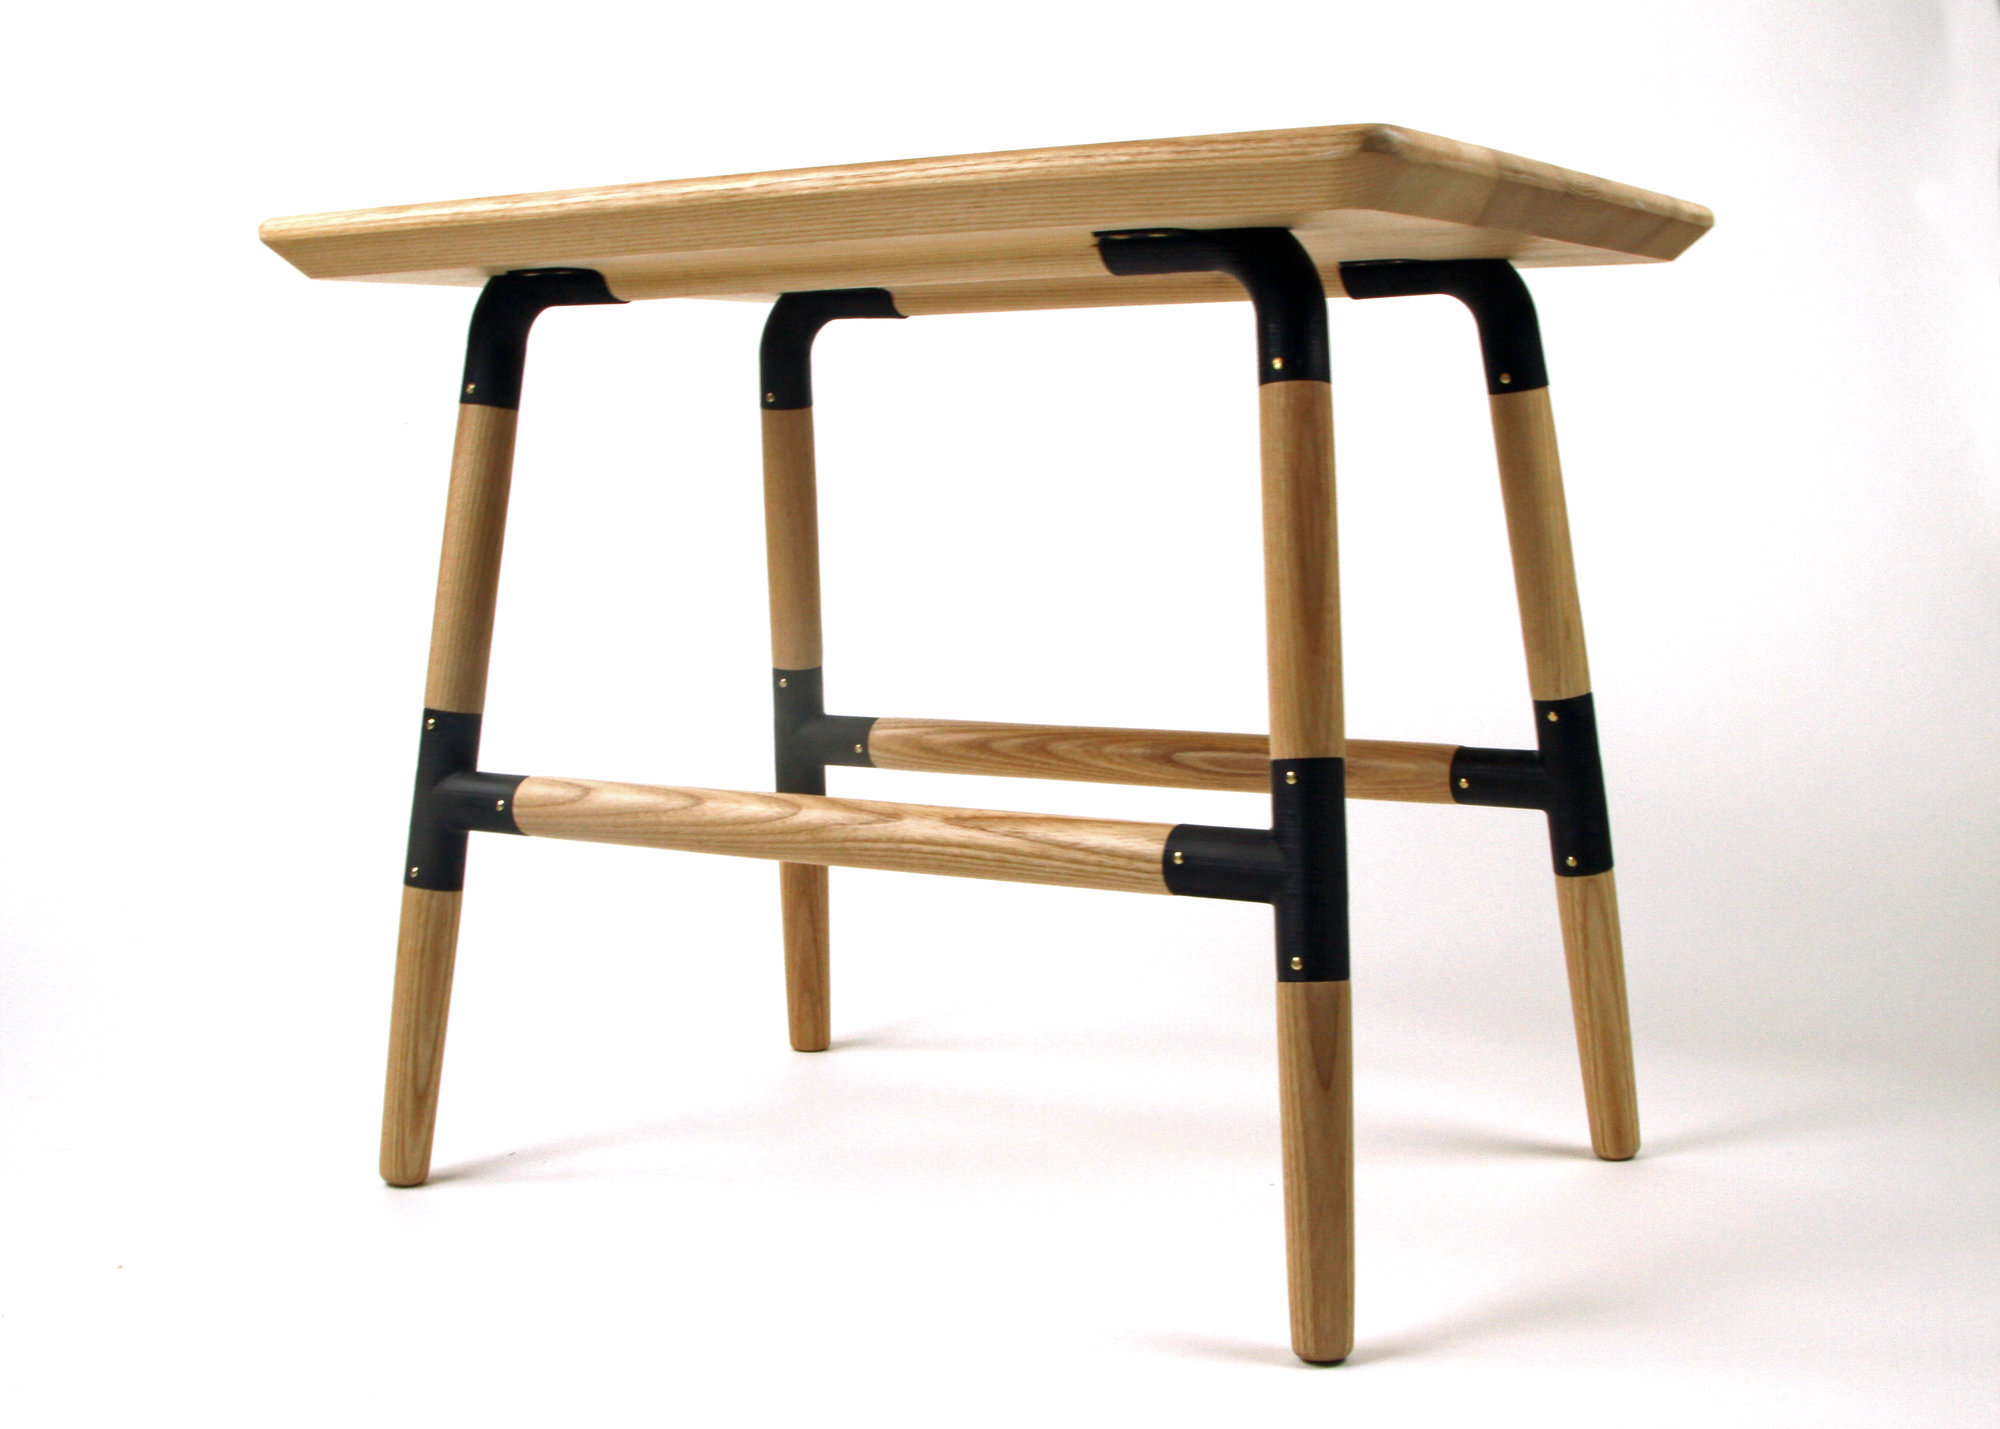 Untitled (Table V - Illusion)